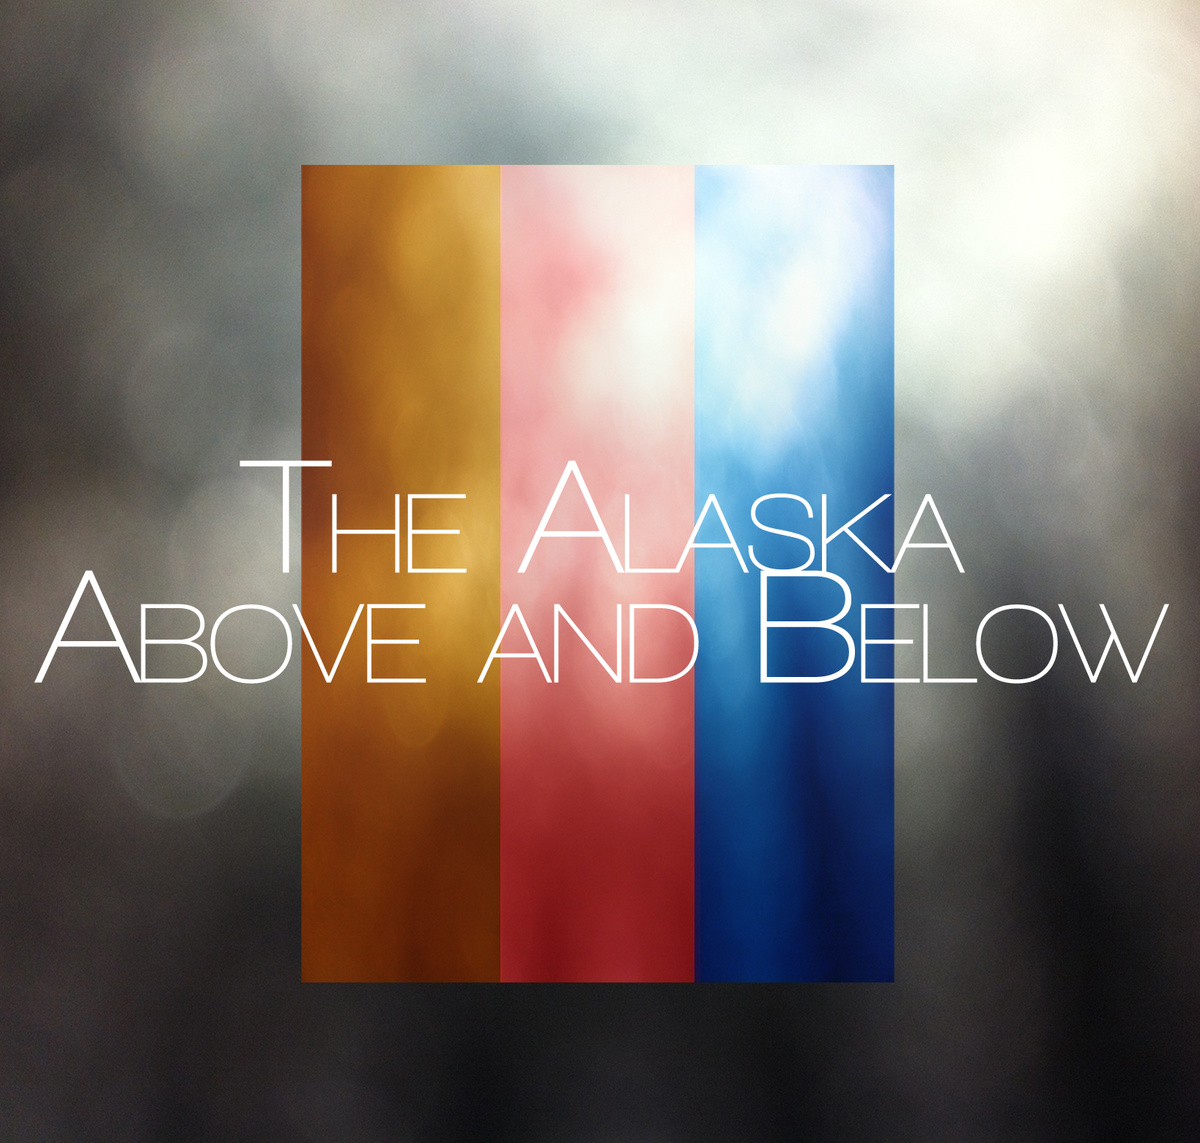 The Alaska.jpg